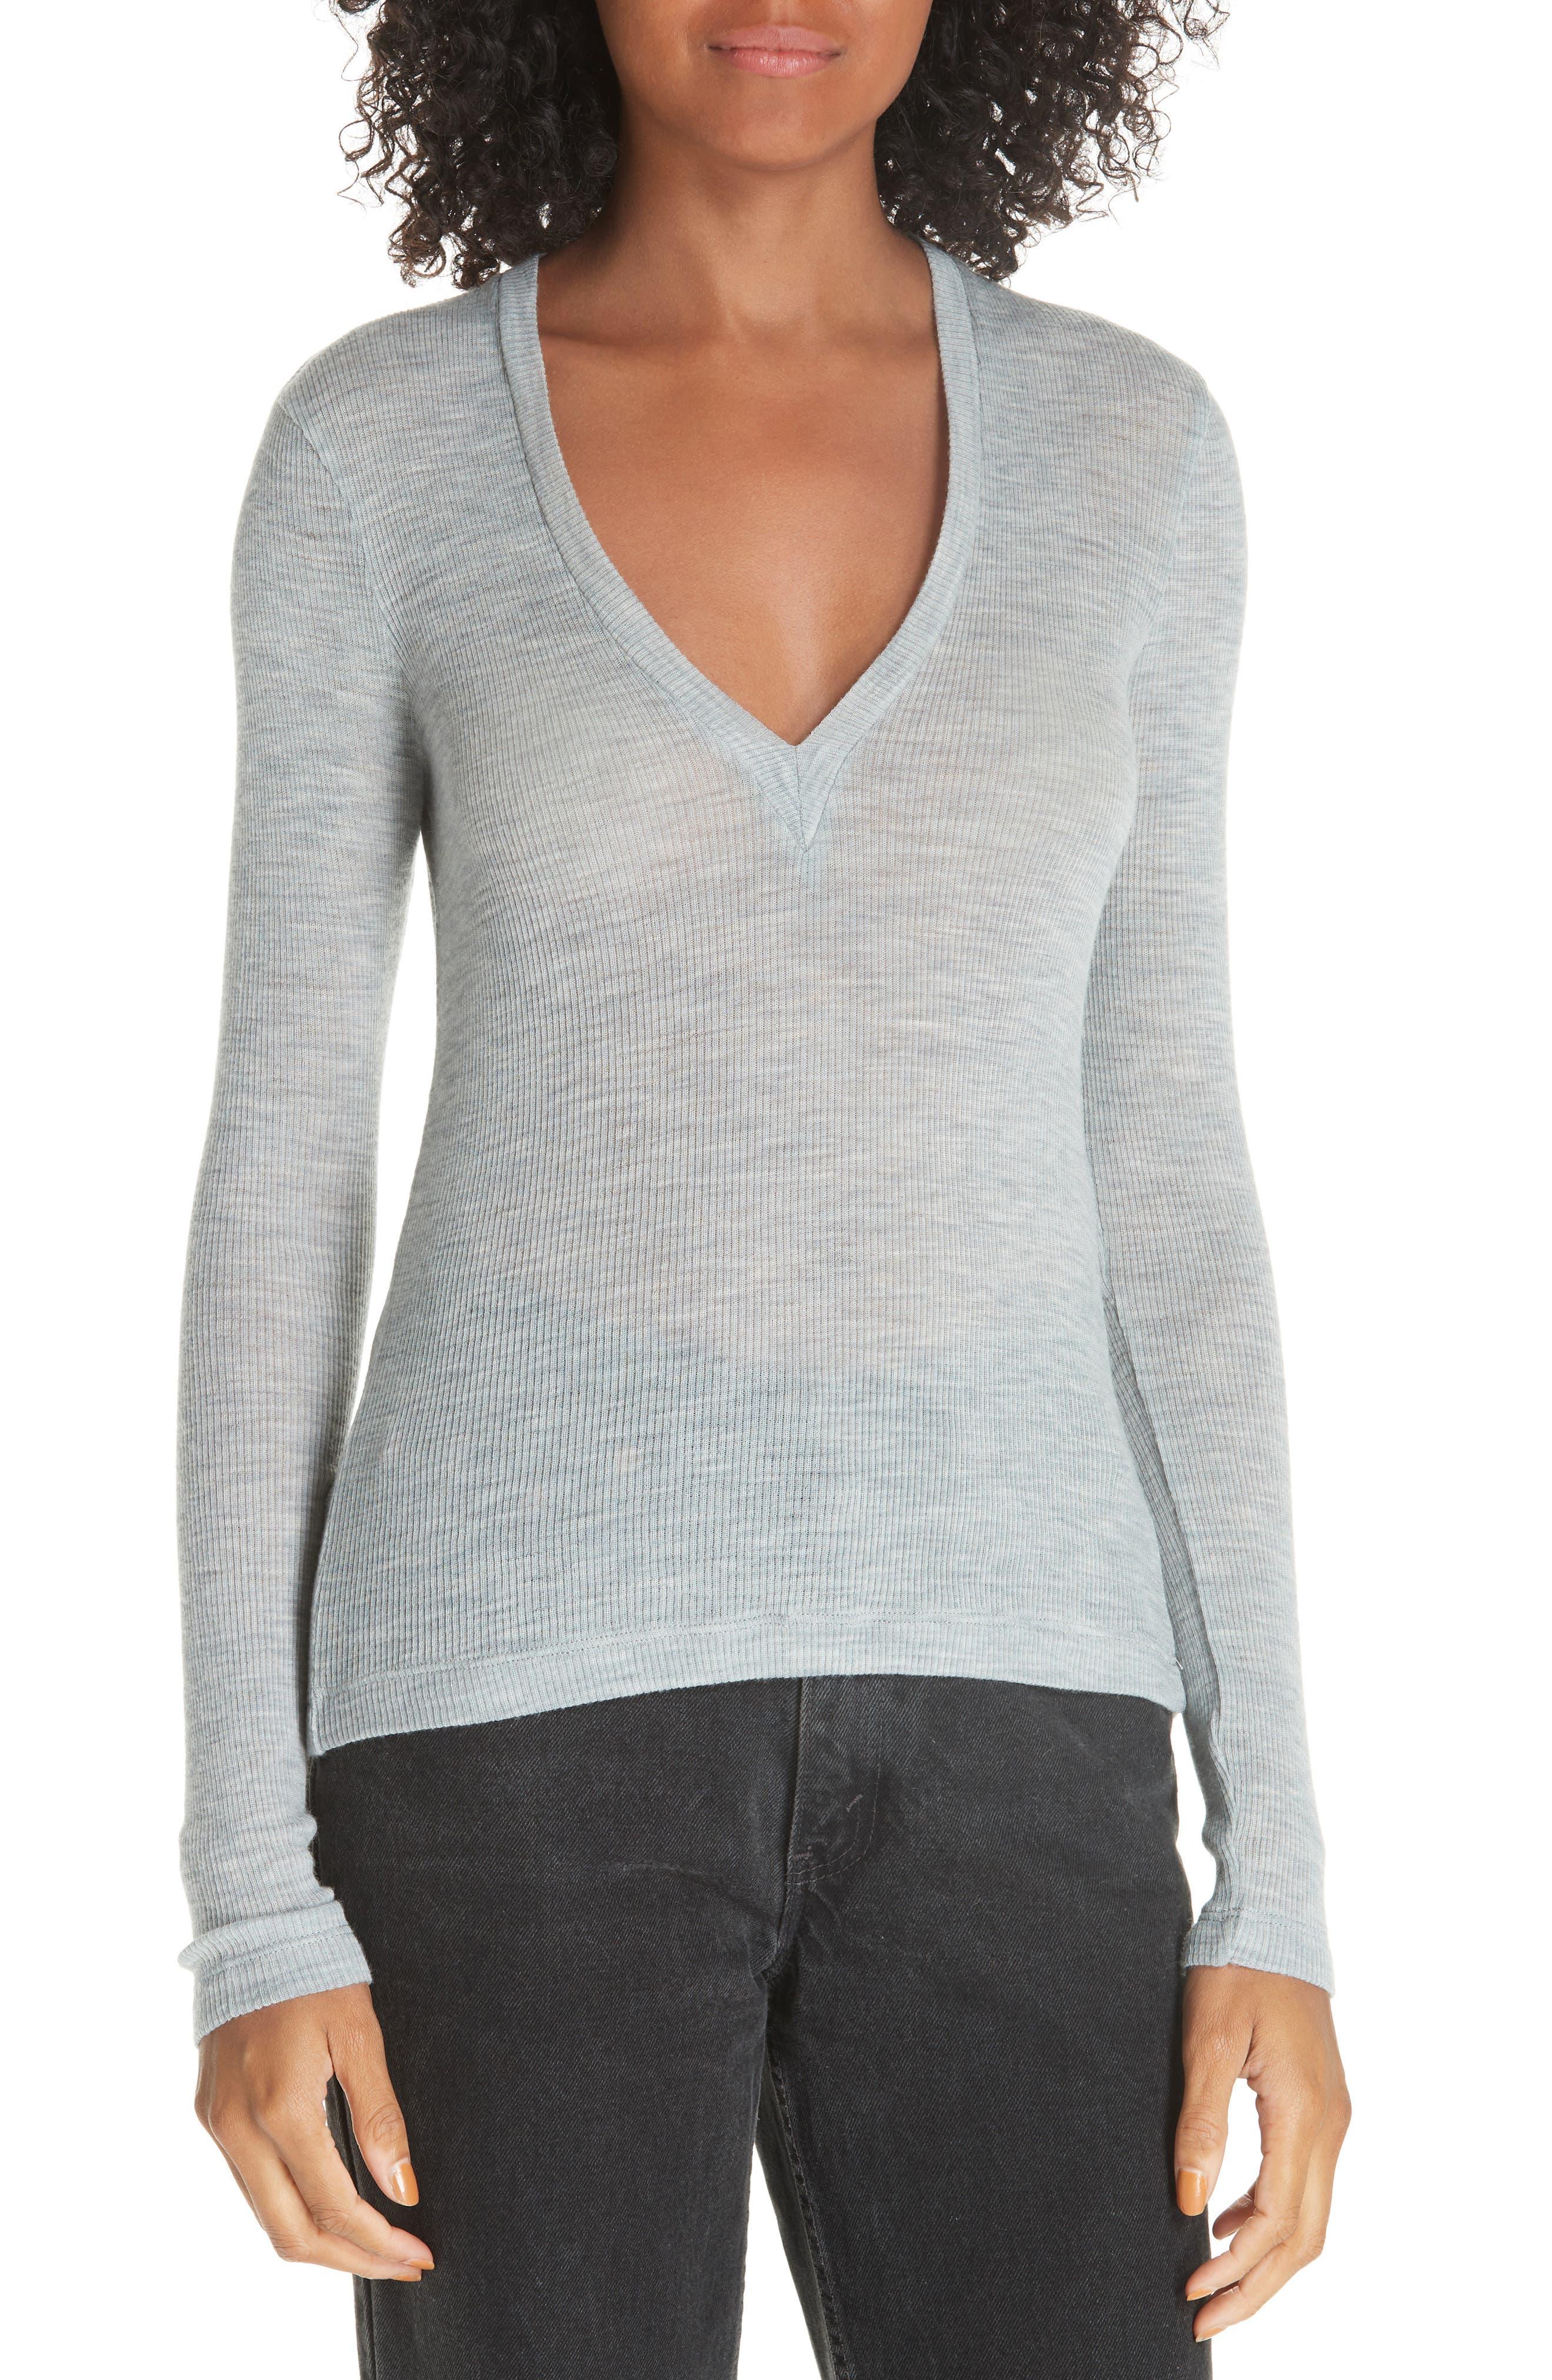 Sheer Rib Wool Top,                         Main,                         color, LIGHT HEATHER GREY